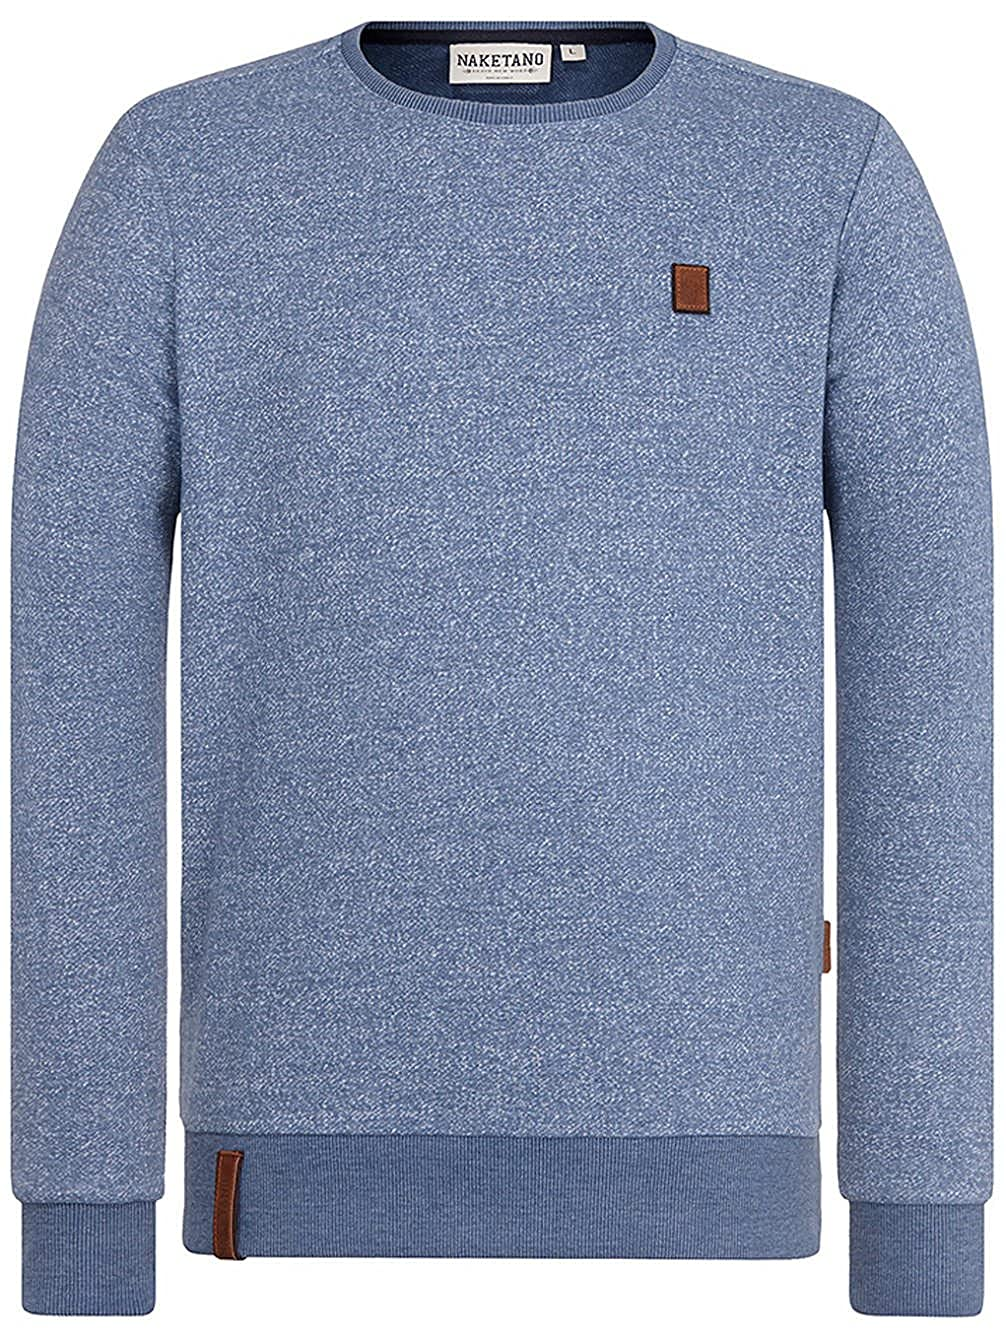 Naketano Herren Sweater Tadellos Abgespritzt III Sweater